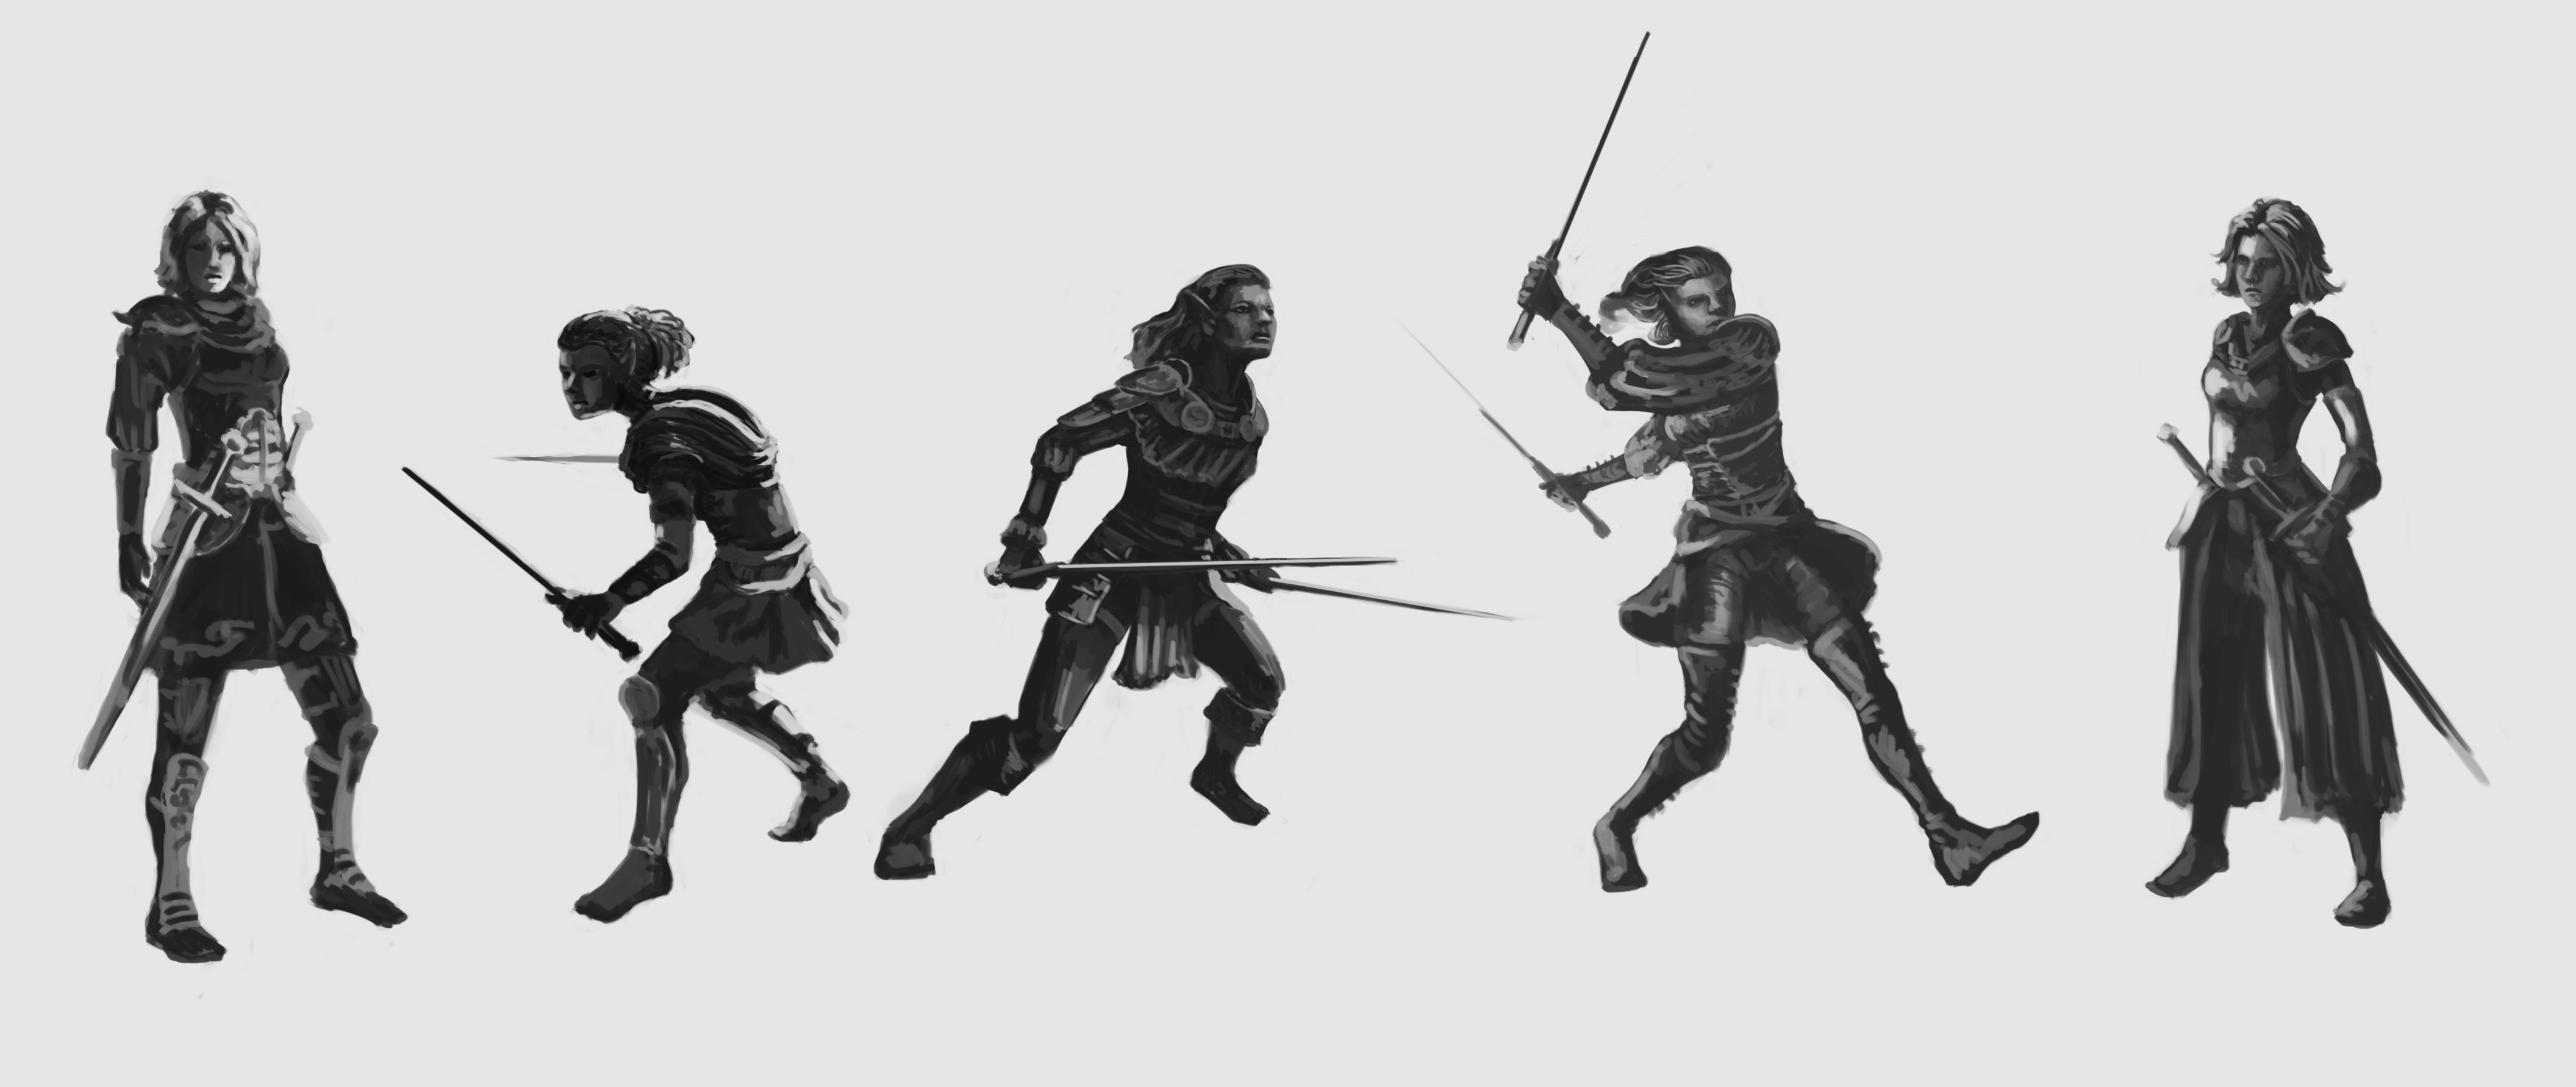 Dual Wielding Warrior Skillshare Projects